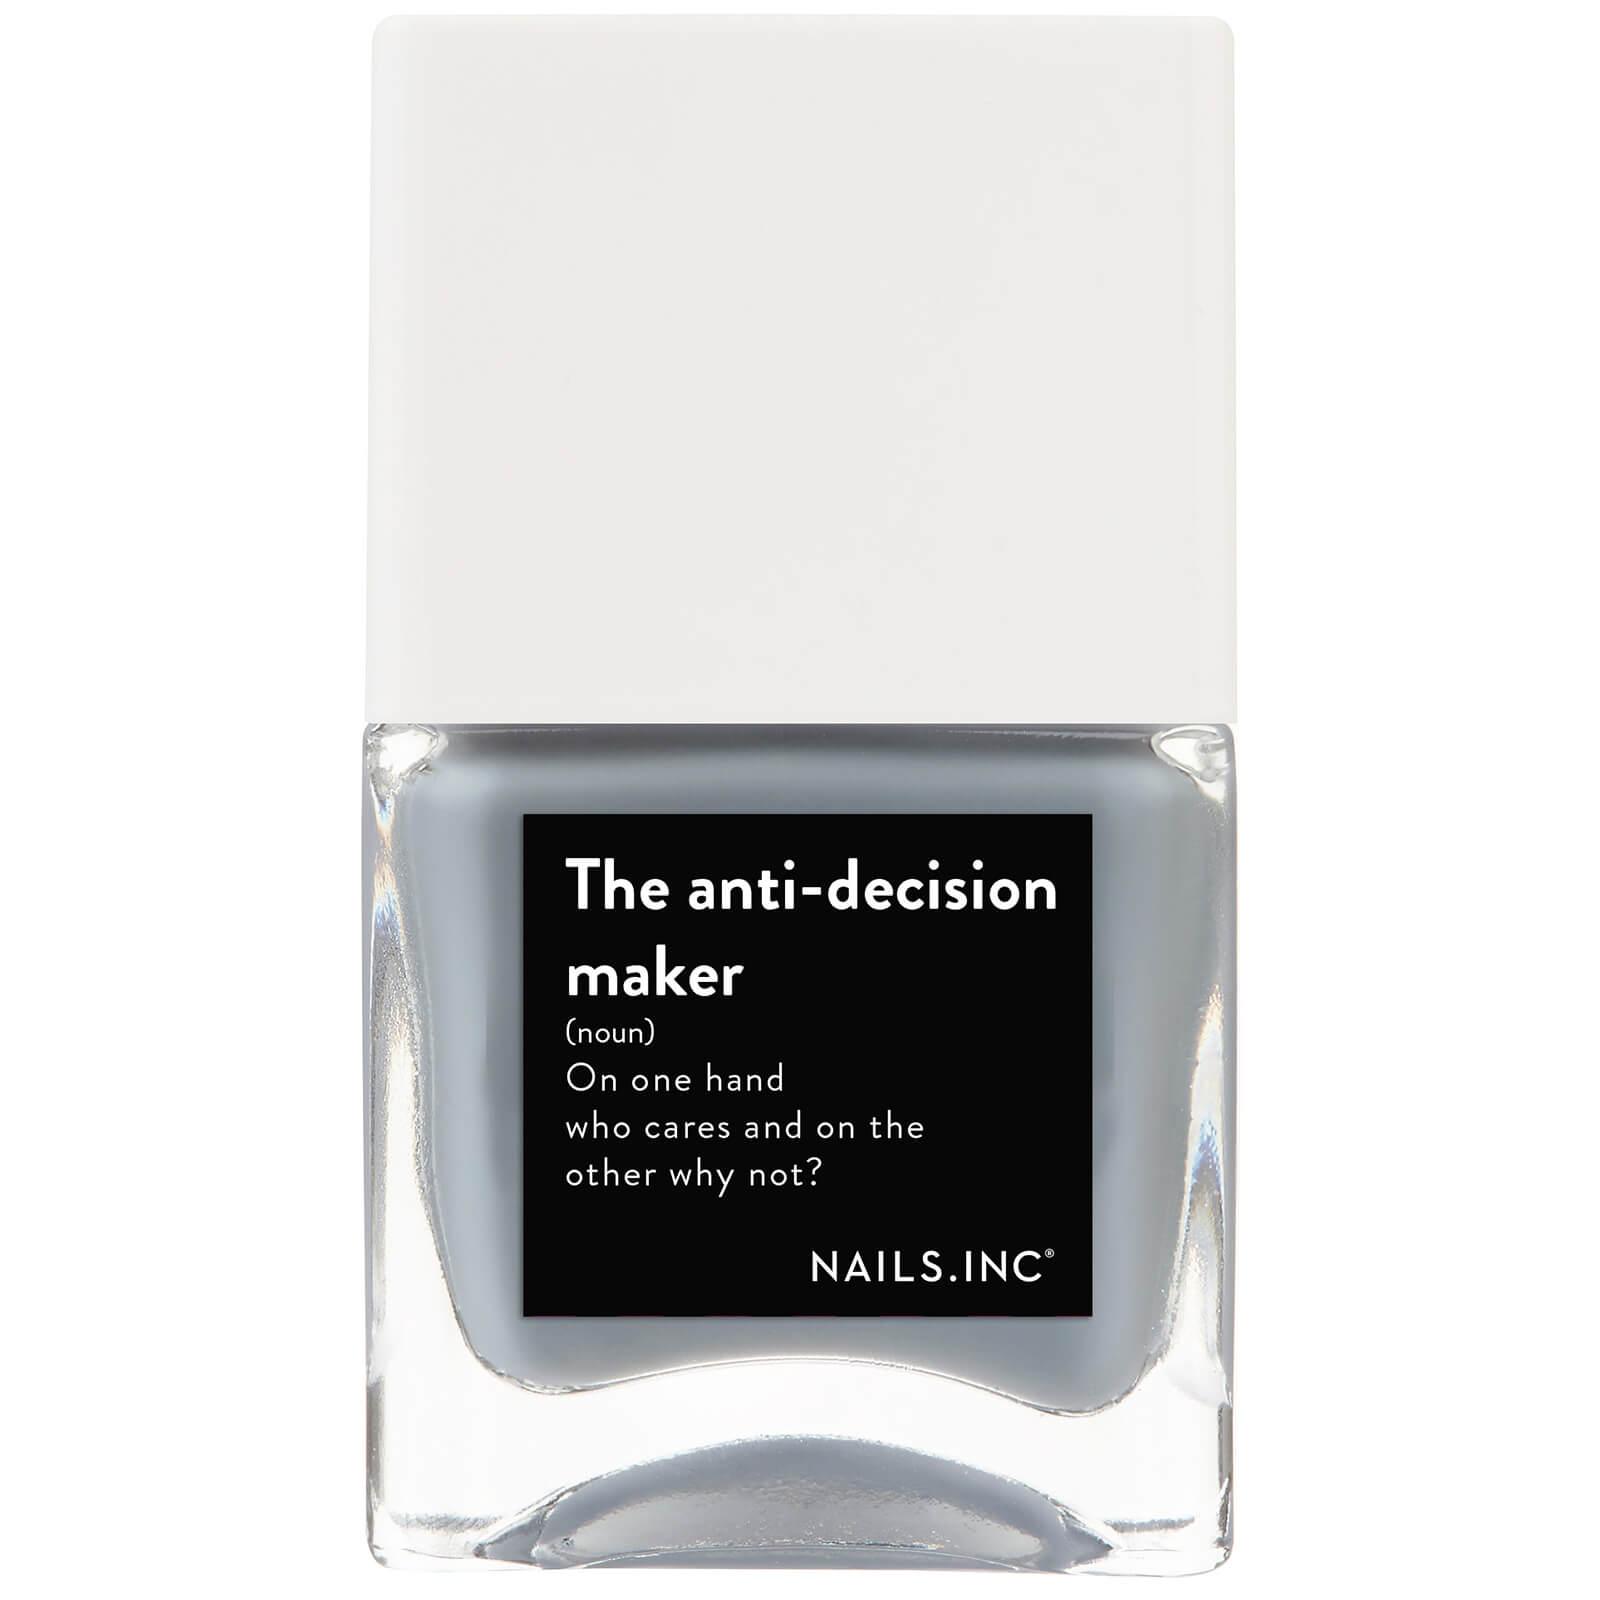 nails inc. Life Hack the Anti-Decision Maker Nail Varnish 14ml